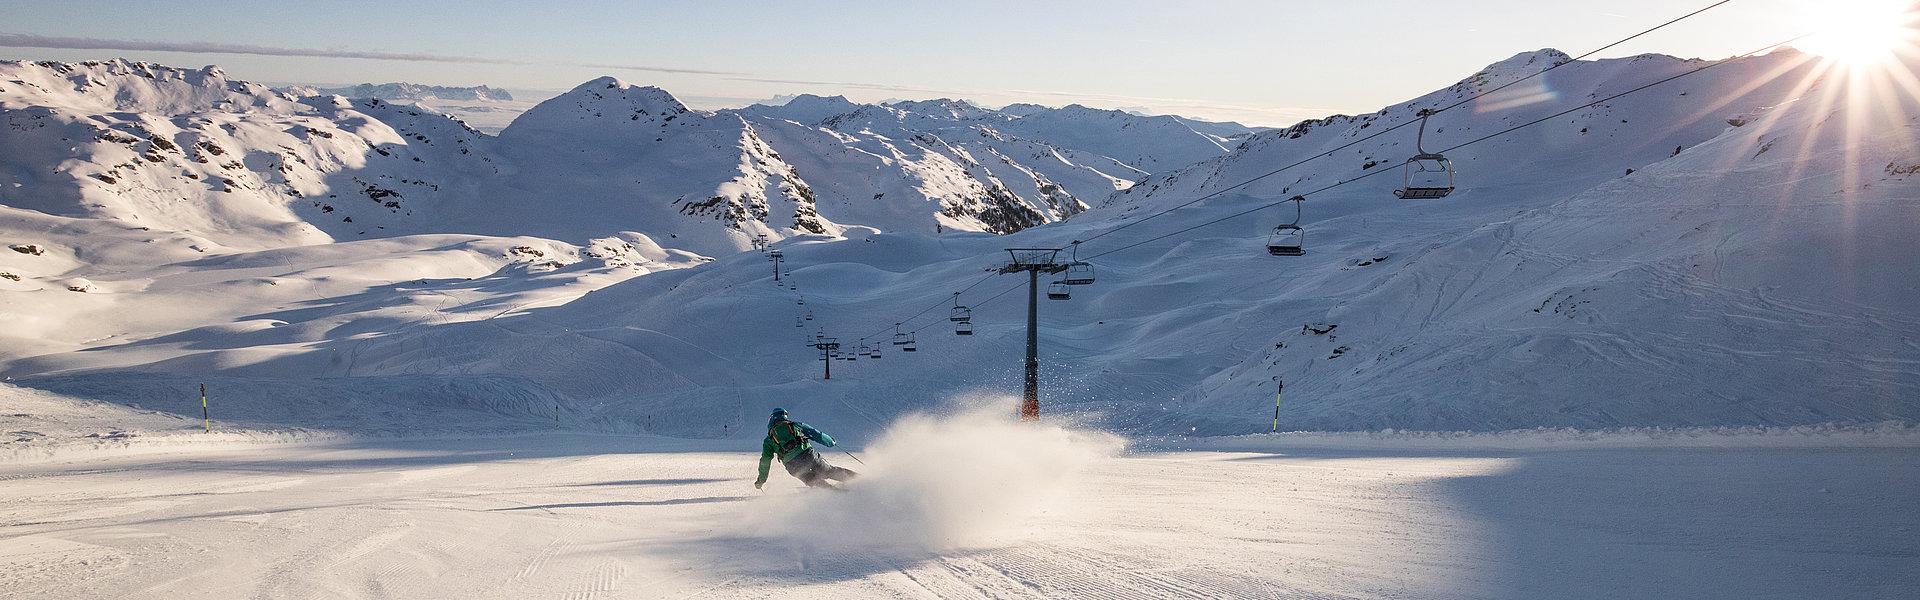 Good Morning Skiing | © Zillertal Arena / Johannes Sautner